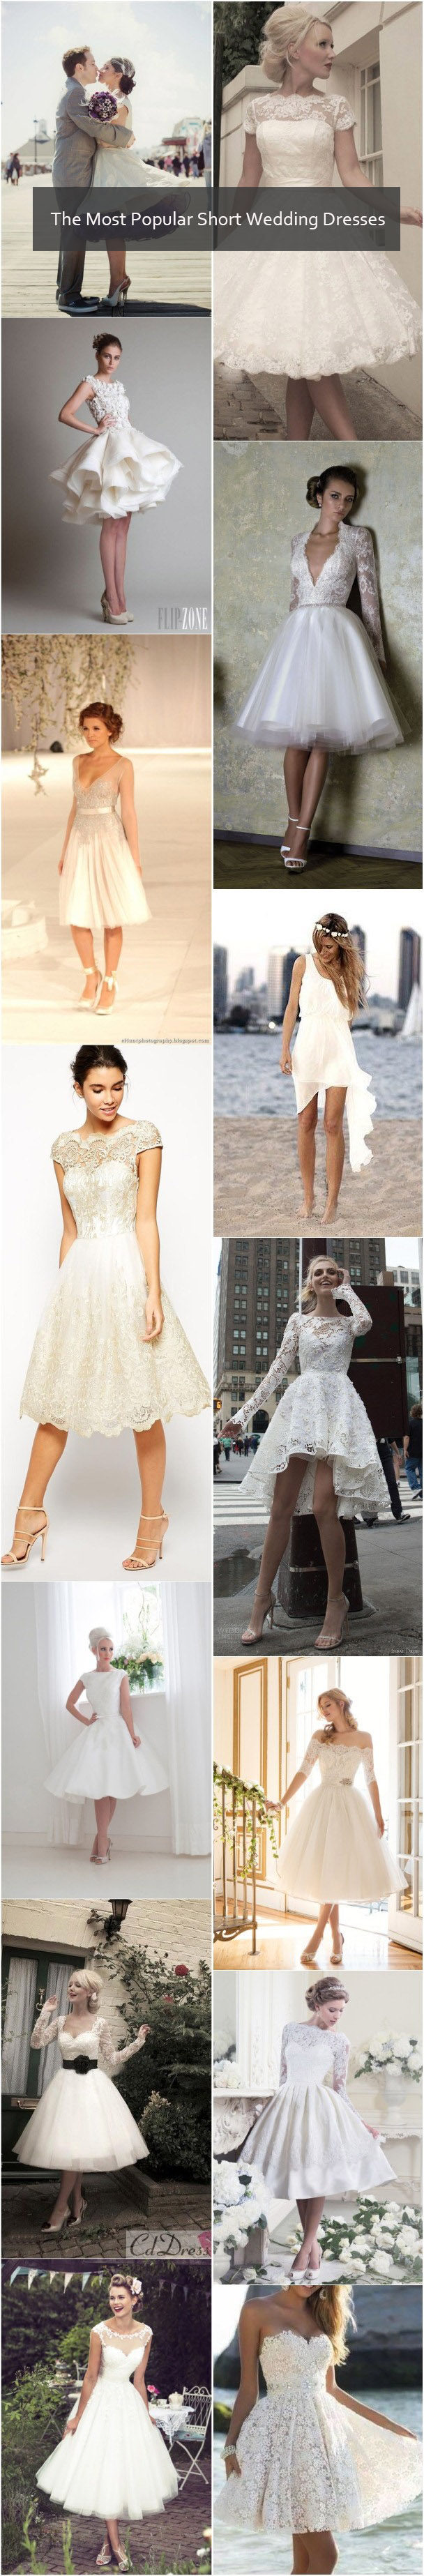 The Most Popular Short Wedding Dresses Ideas